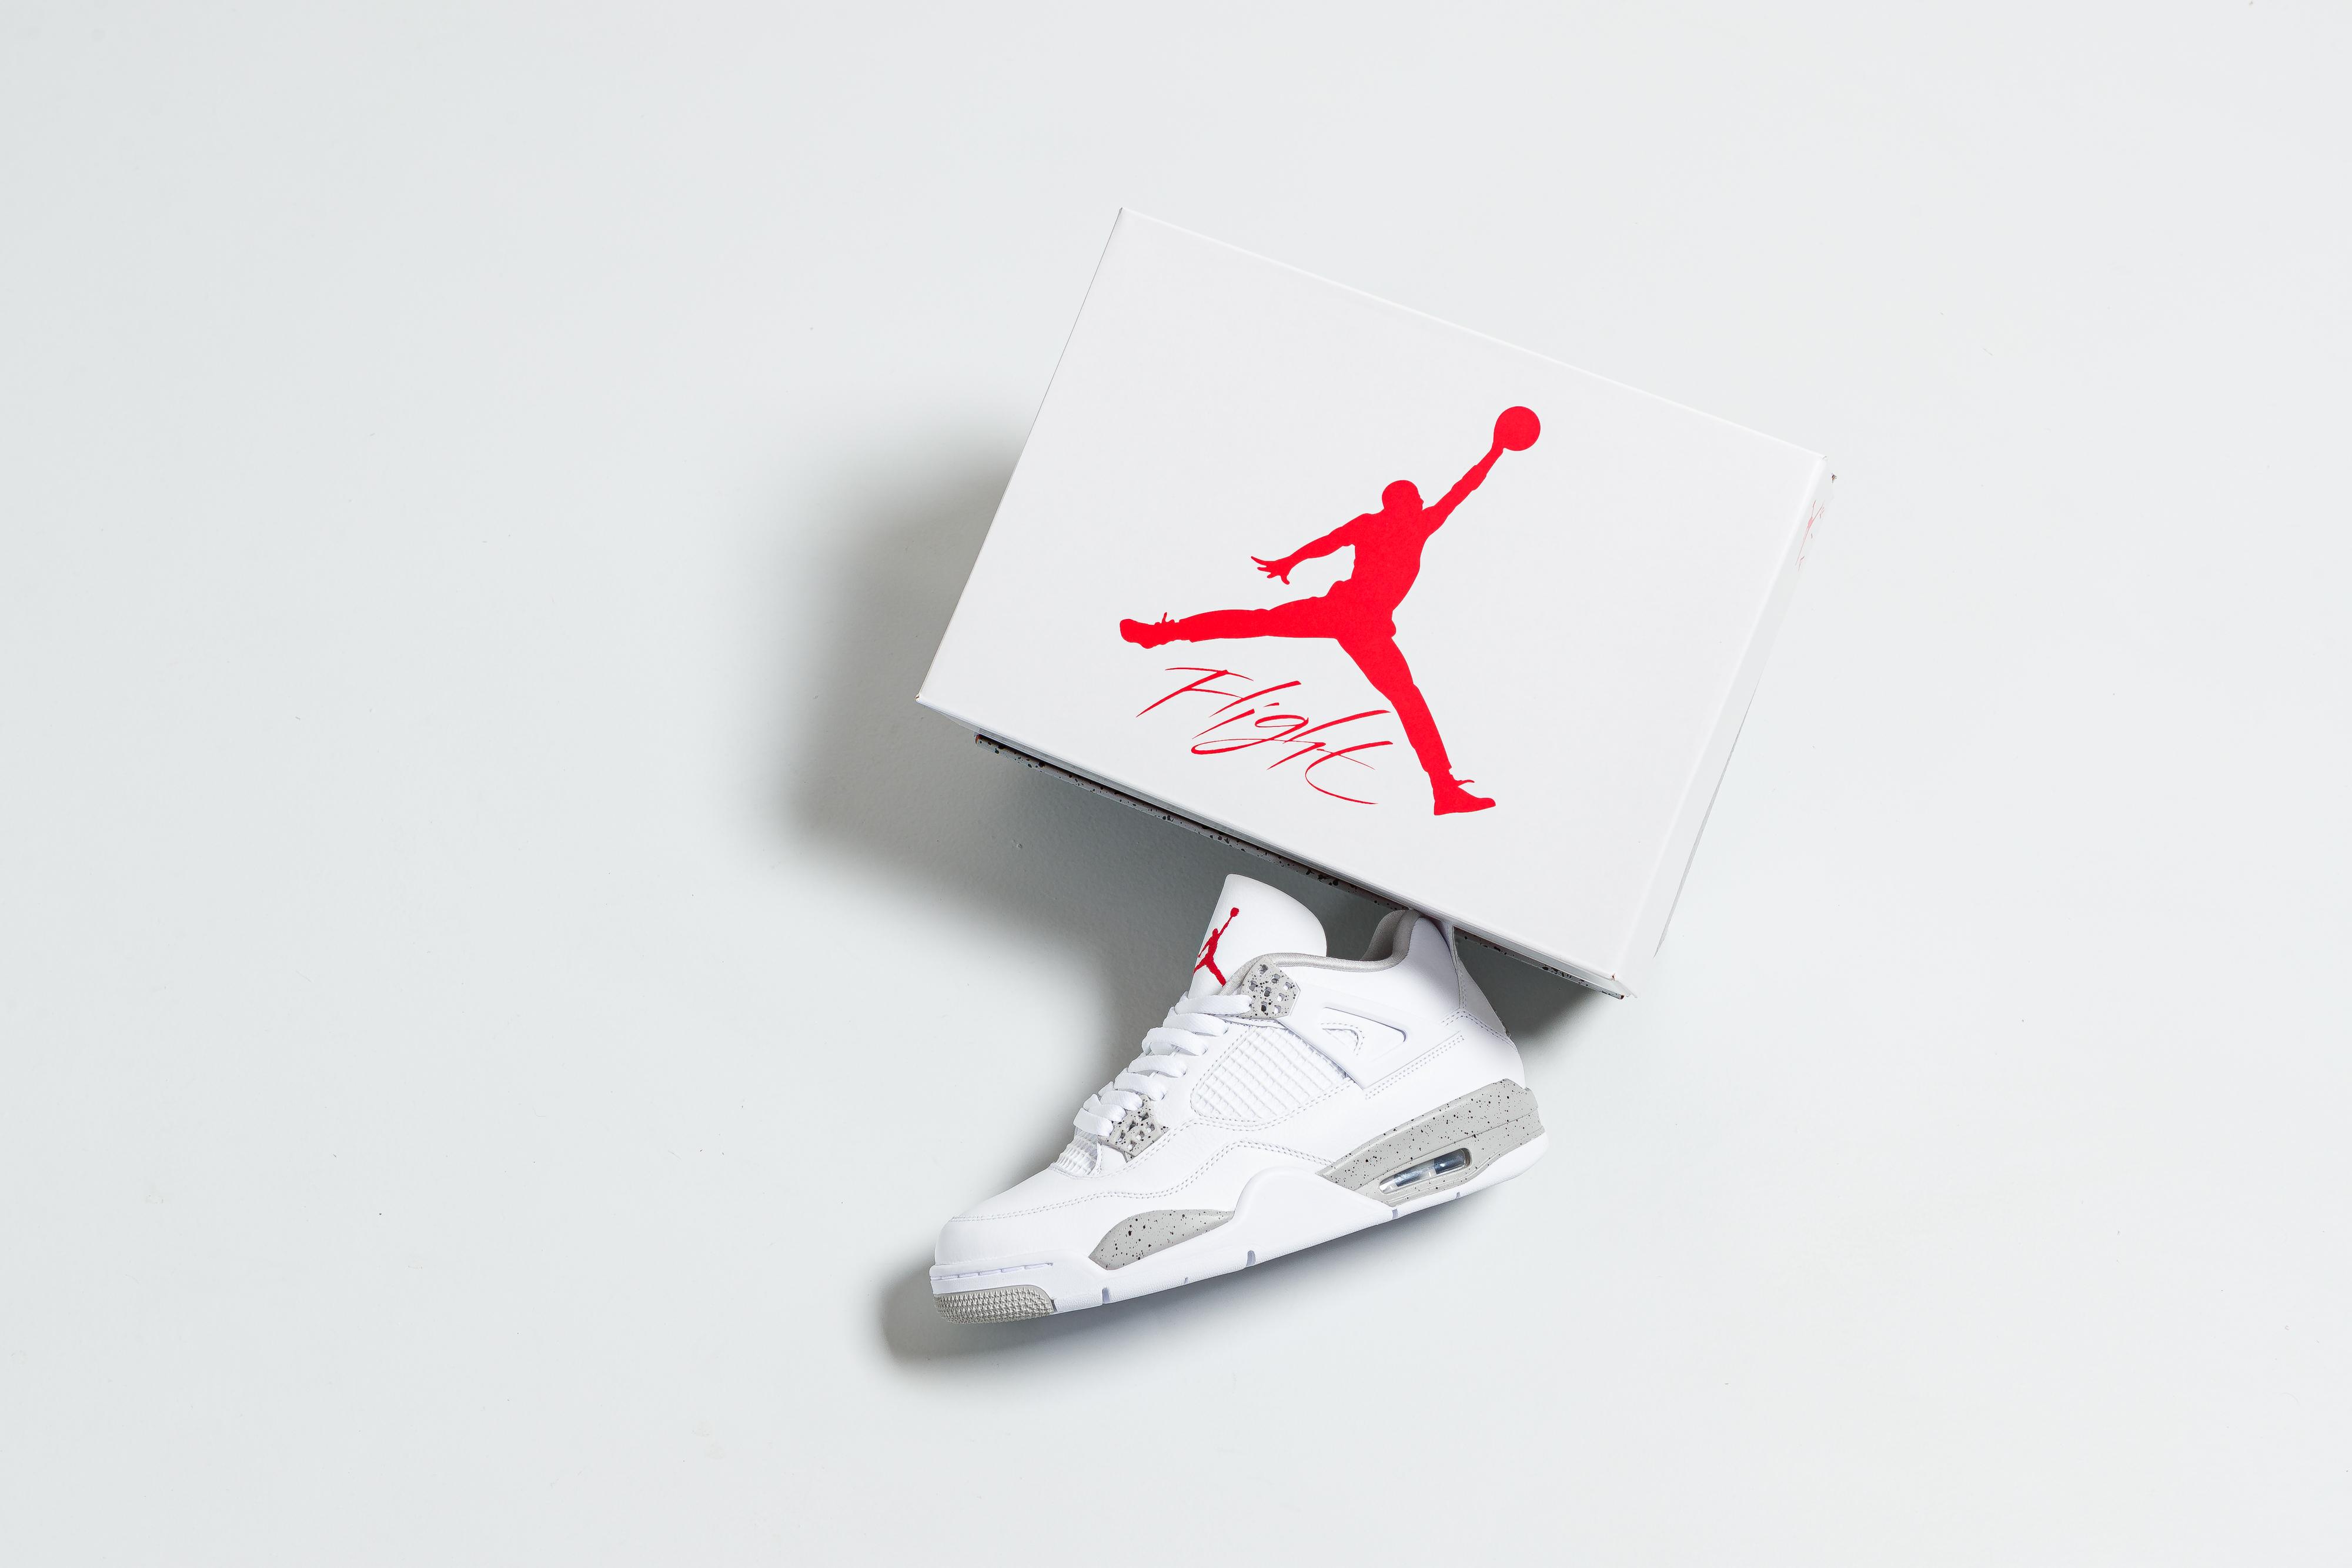 Jordan - Air Jordan 4 Retro - White/Tech Grey-Black-Fire Red - Up There